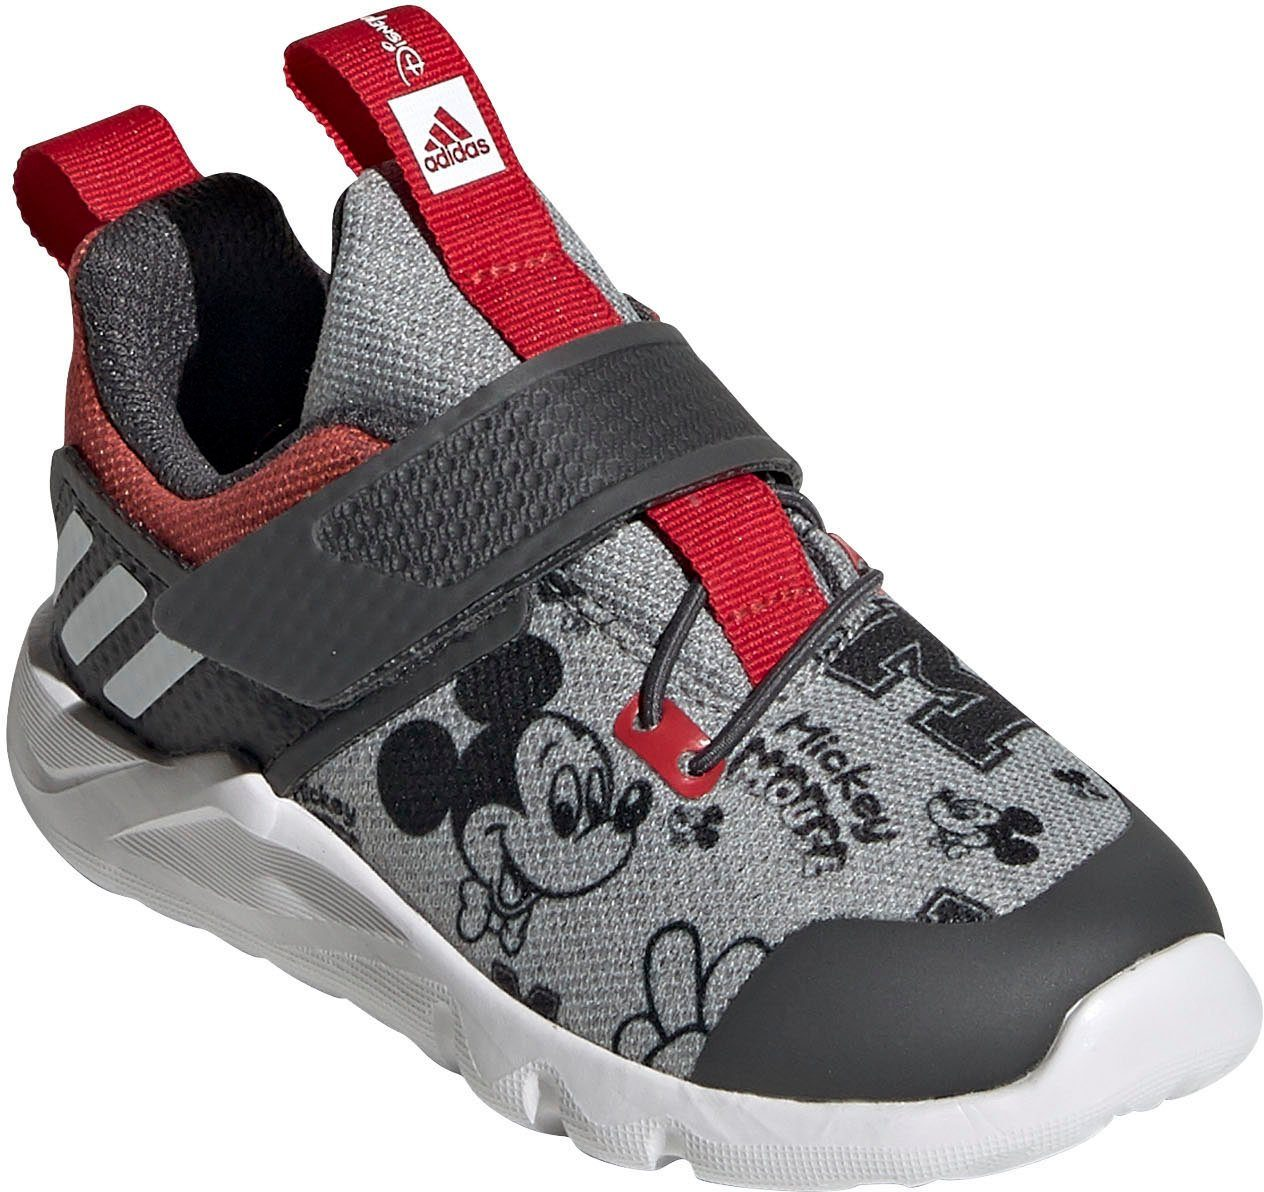 adidas Performance RapidaFlex Mickey Schuh Fitnessschuh